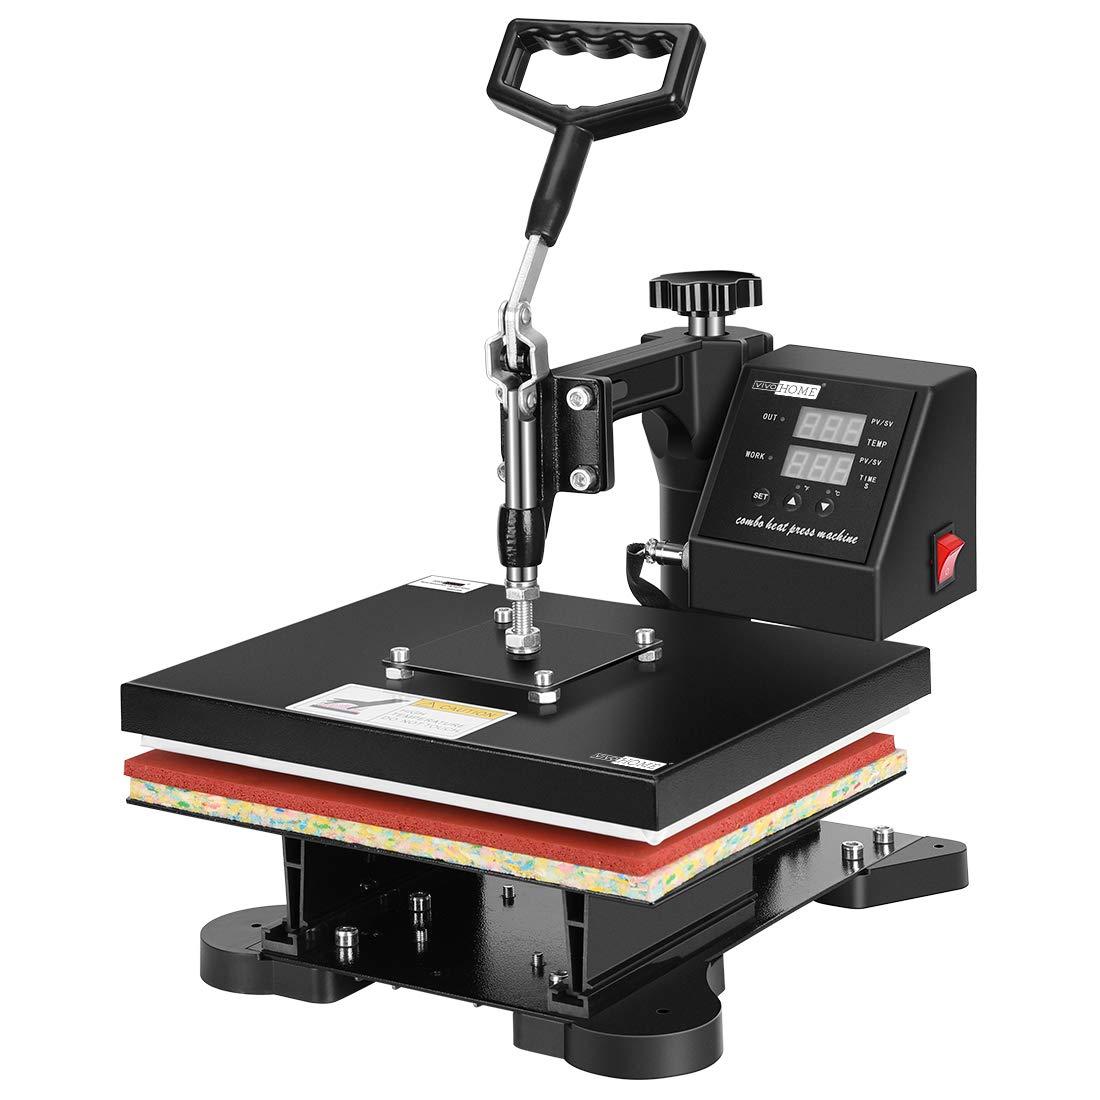 VIVOHOME Swing Away Clamshell Printing Heat Press Machine for T-Shirt 12 x 10 Inch